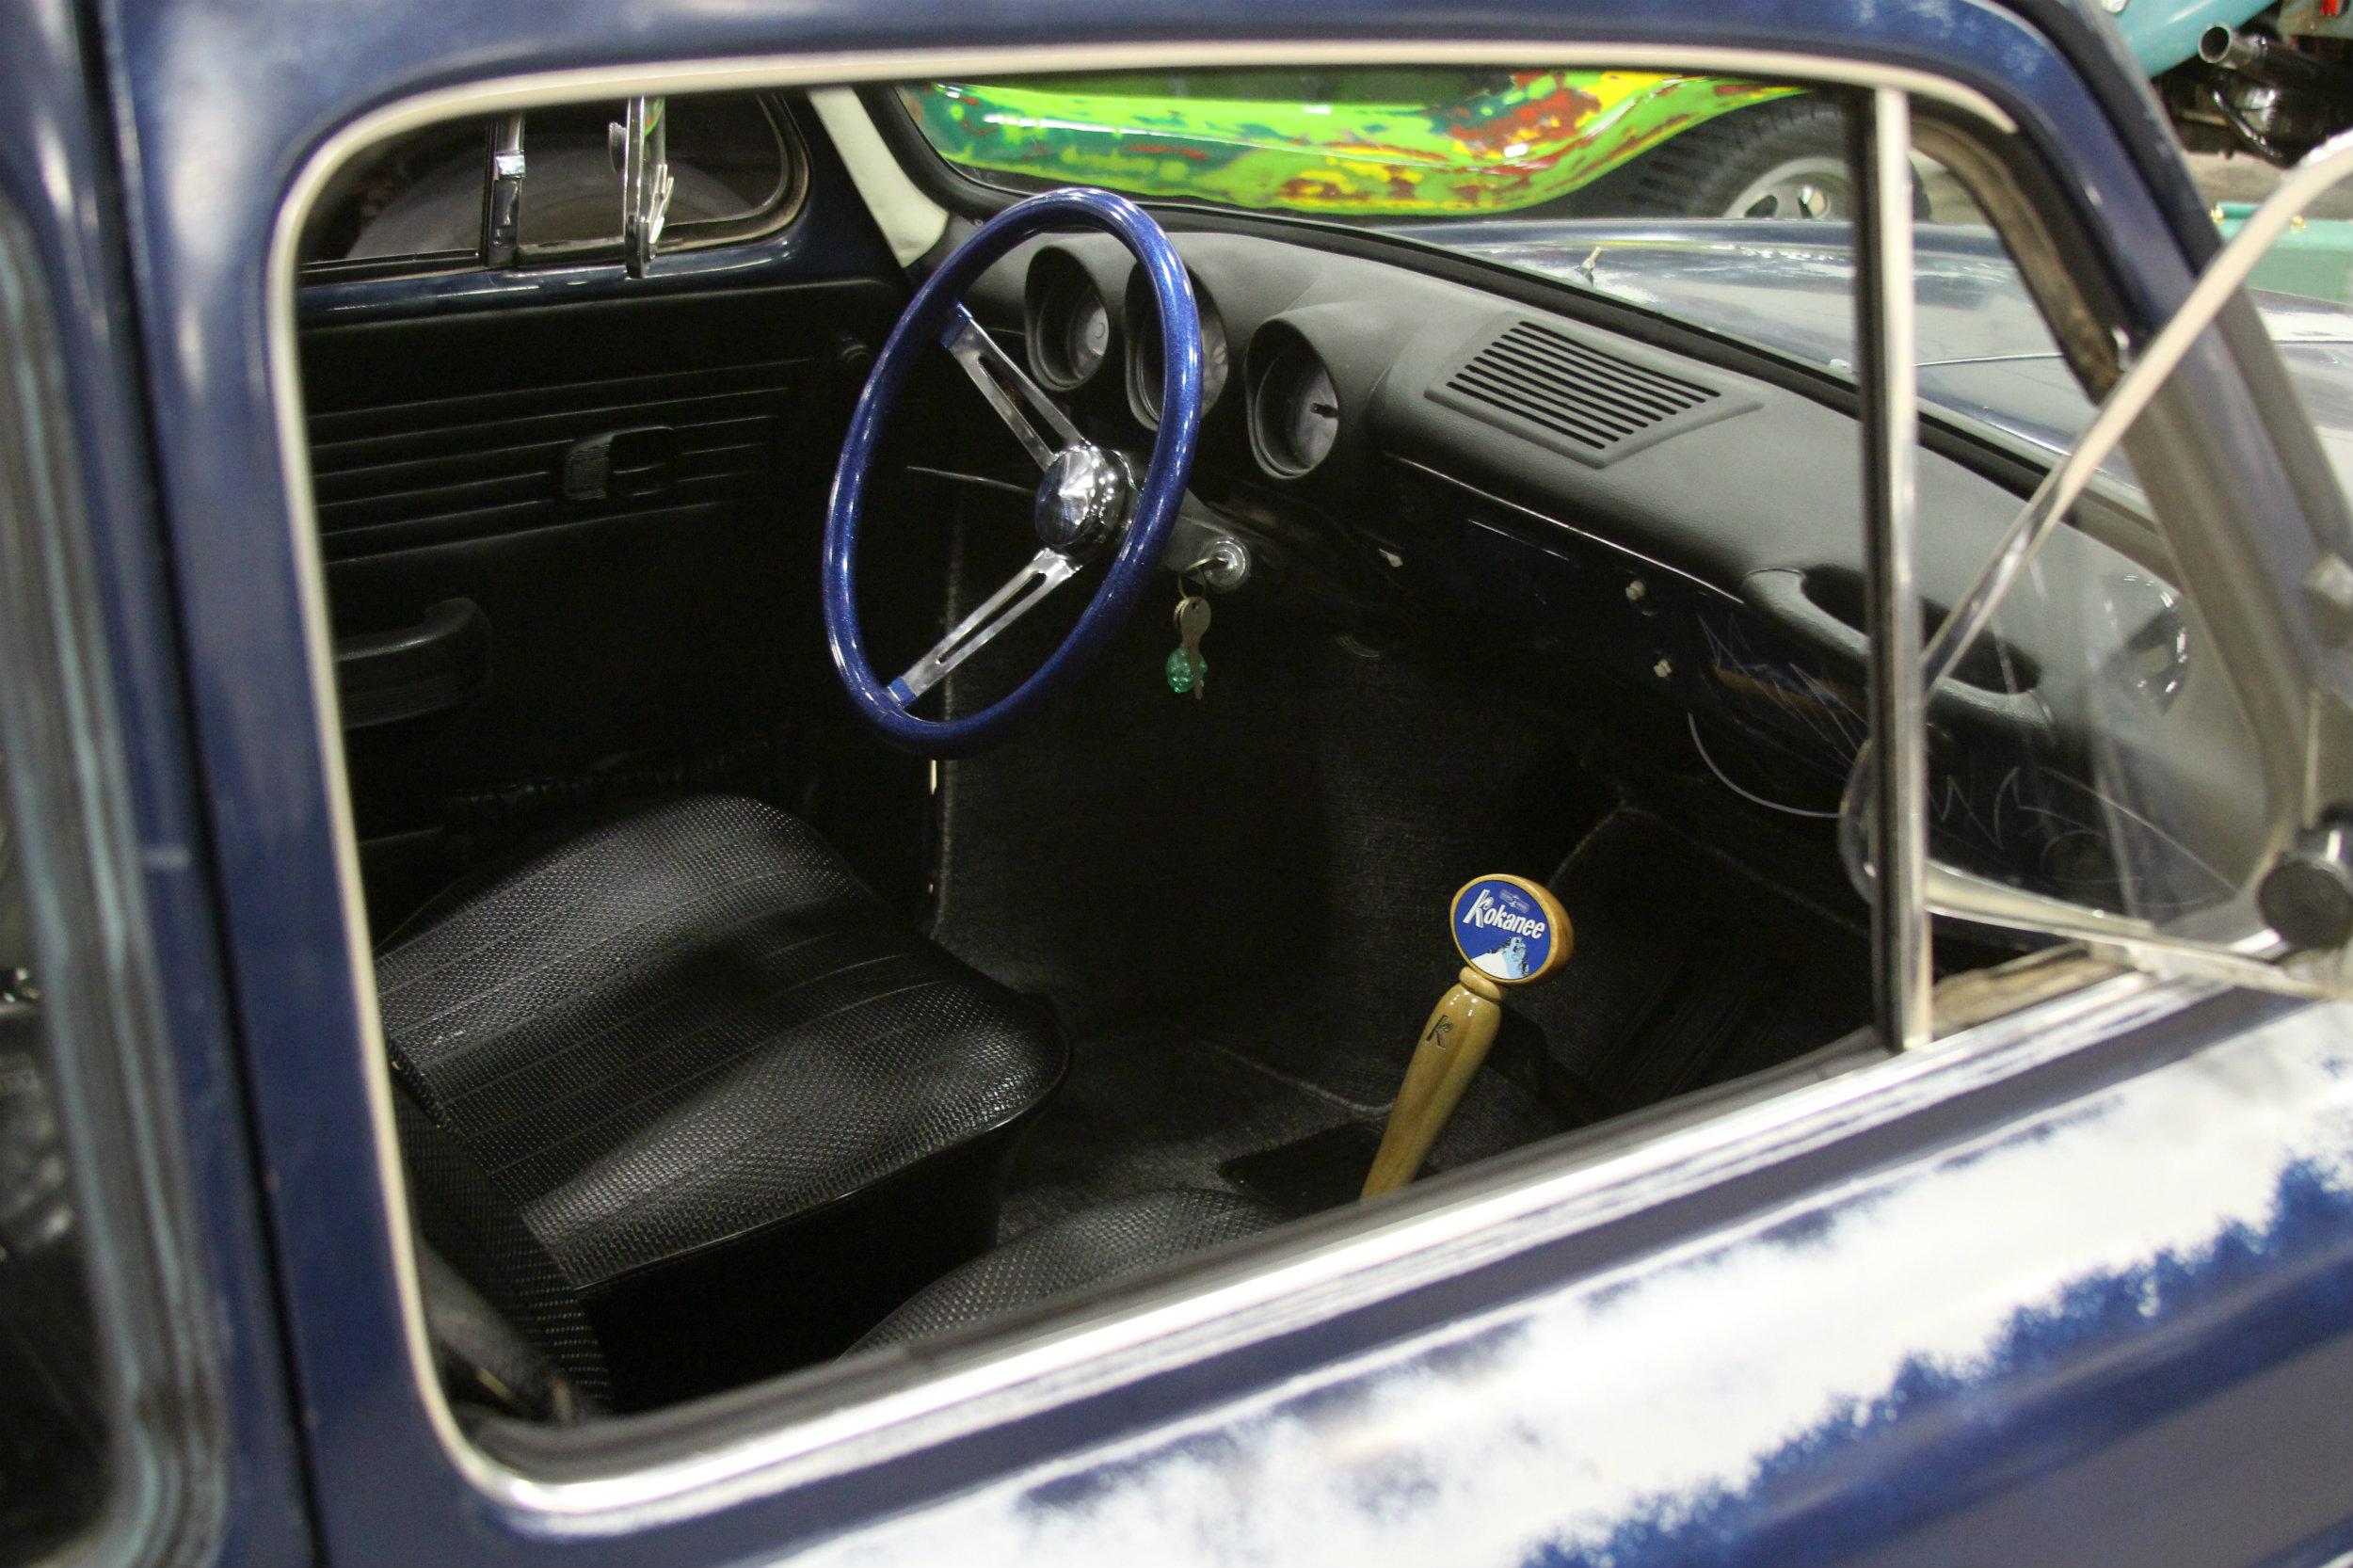 File:1970 Volkswagen Type 3 Squareback interior (11959267904).jpg